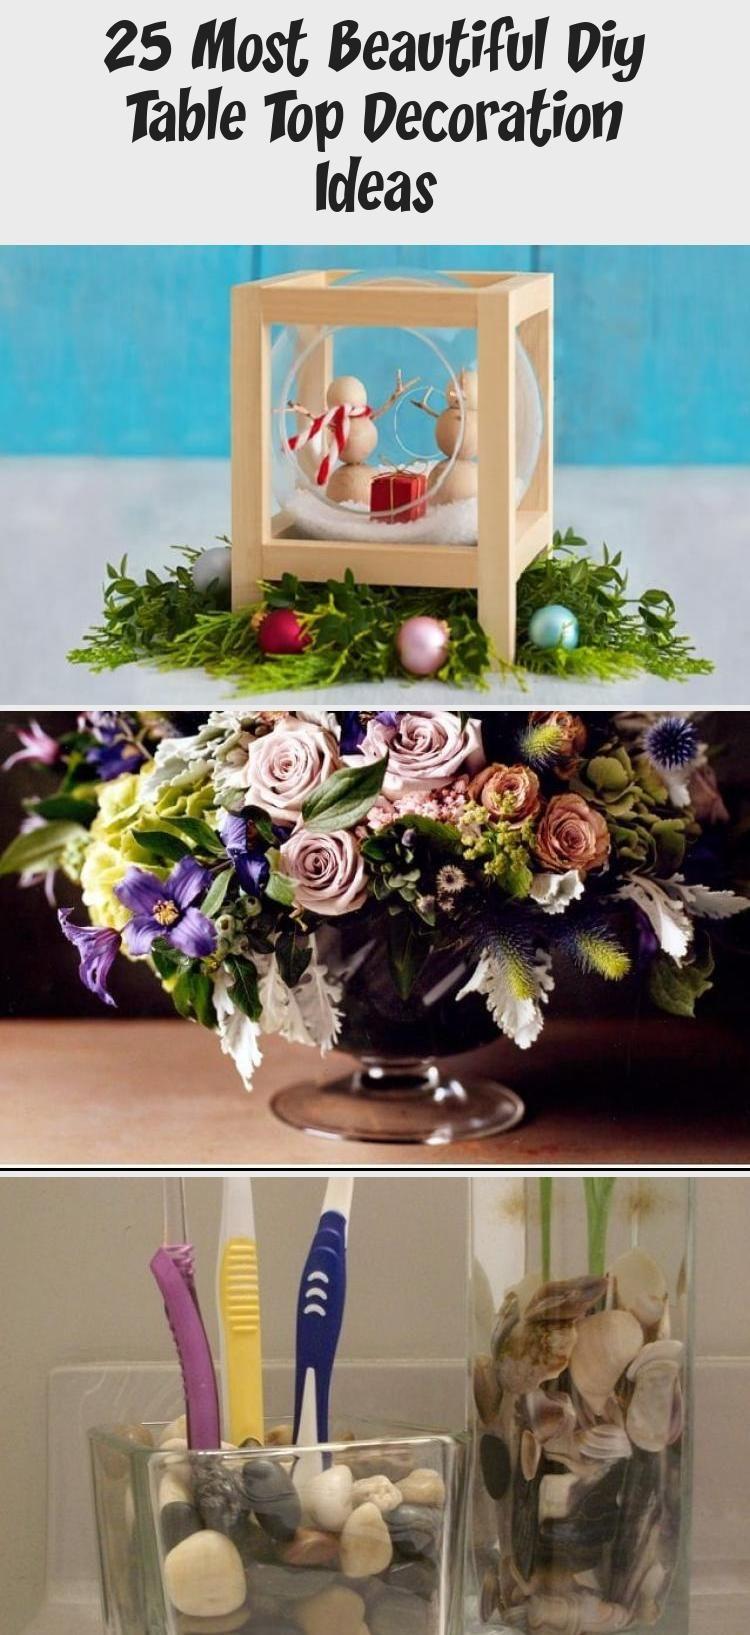 25 most beautiful diy table top decoration ideas decor